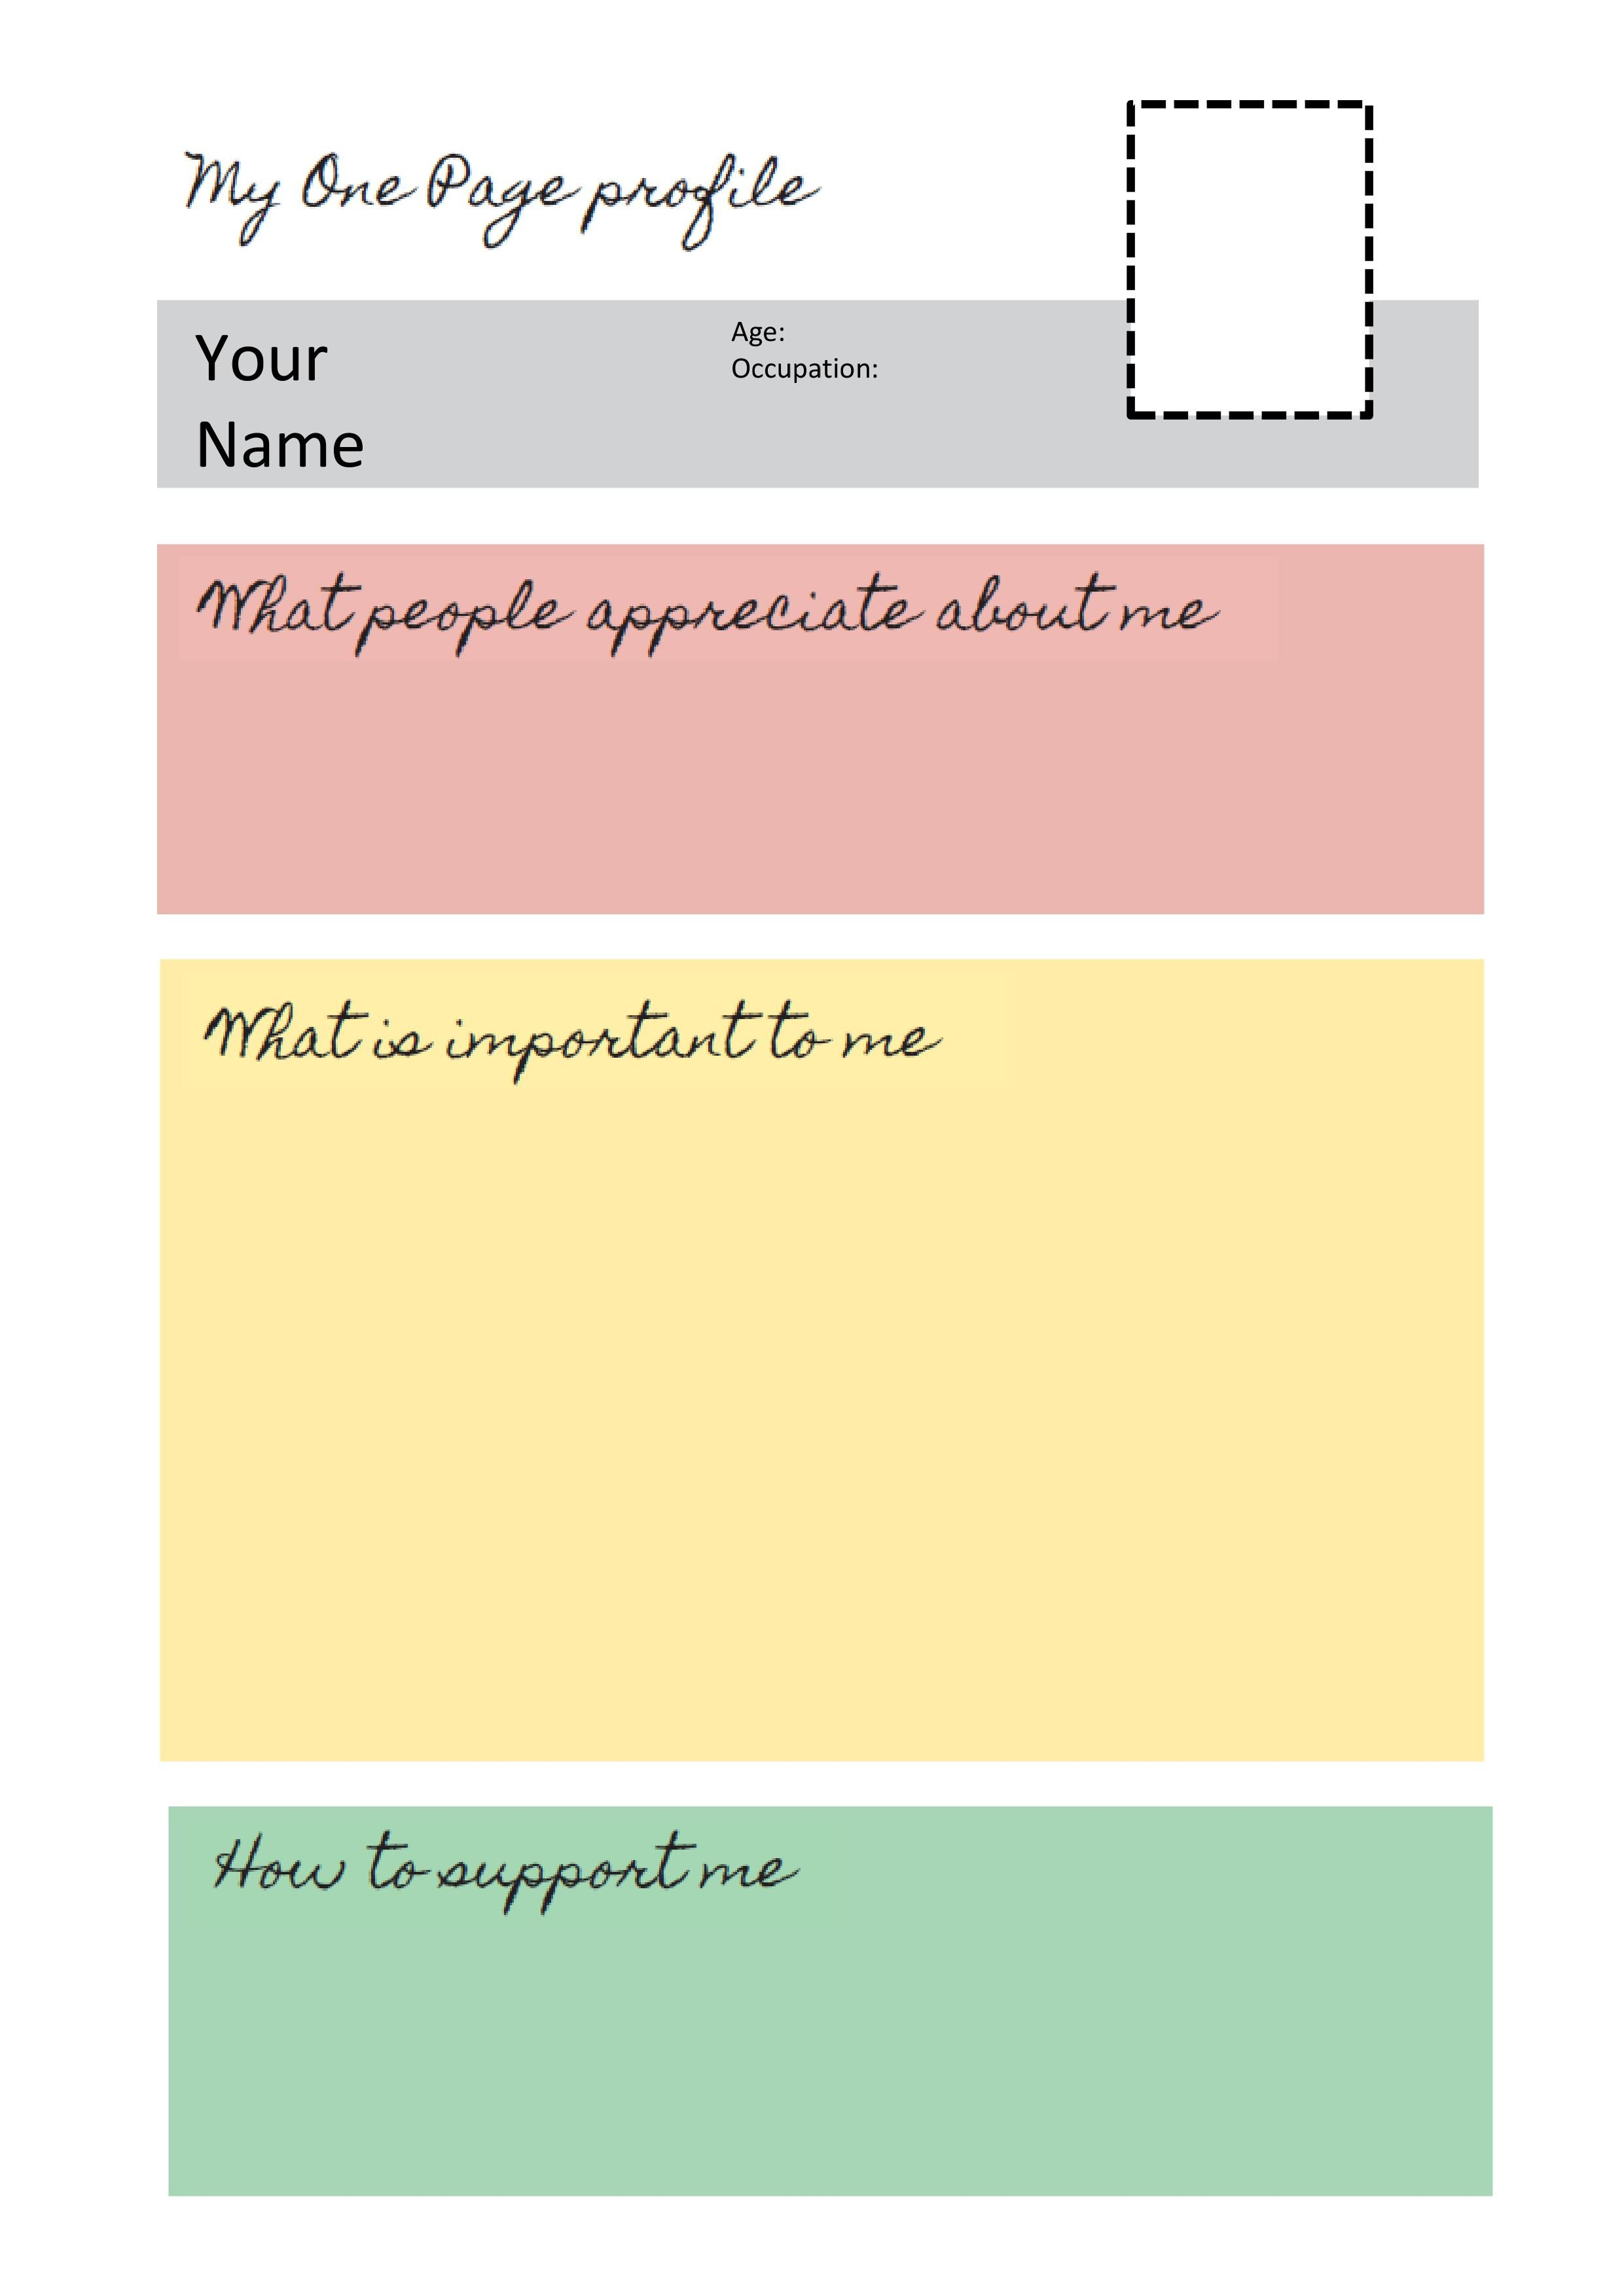 One Page Template Free E Page Profile Templates Helen Sanderson associates